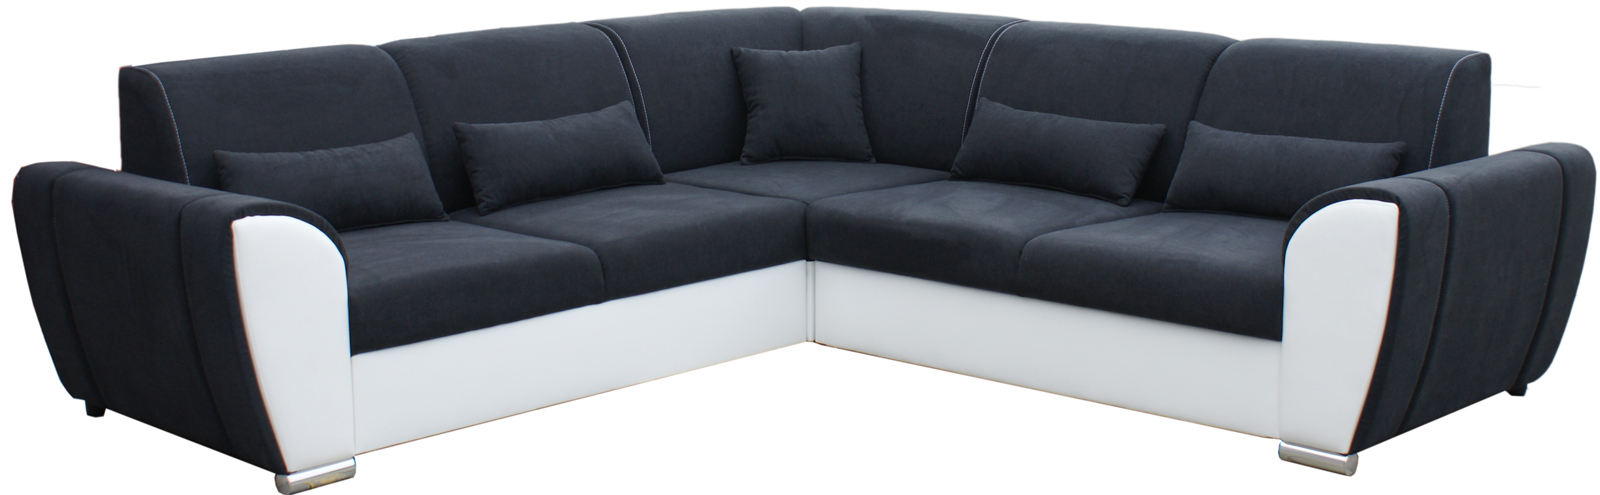 Rohová sedací souprava - Po-Sed - Denim (černá + bílá) (L)